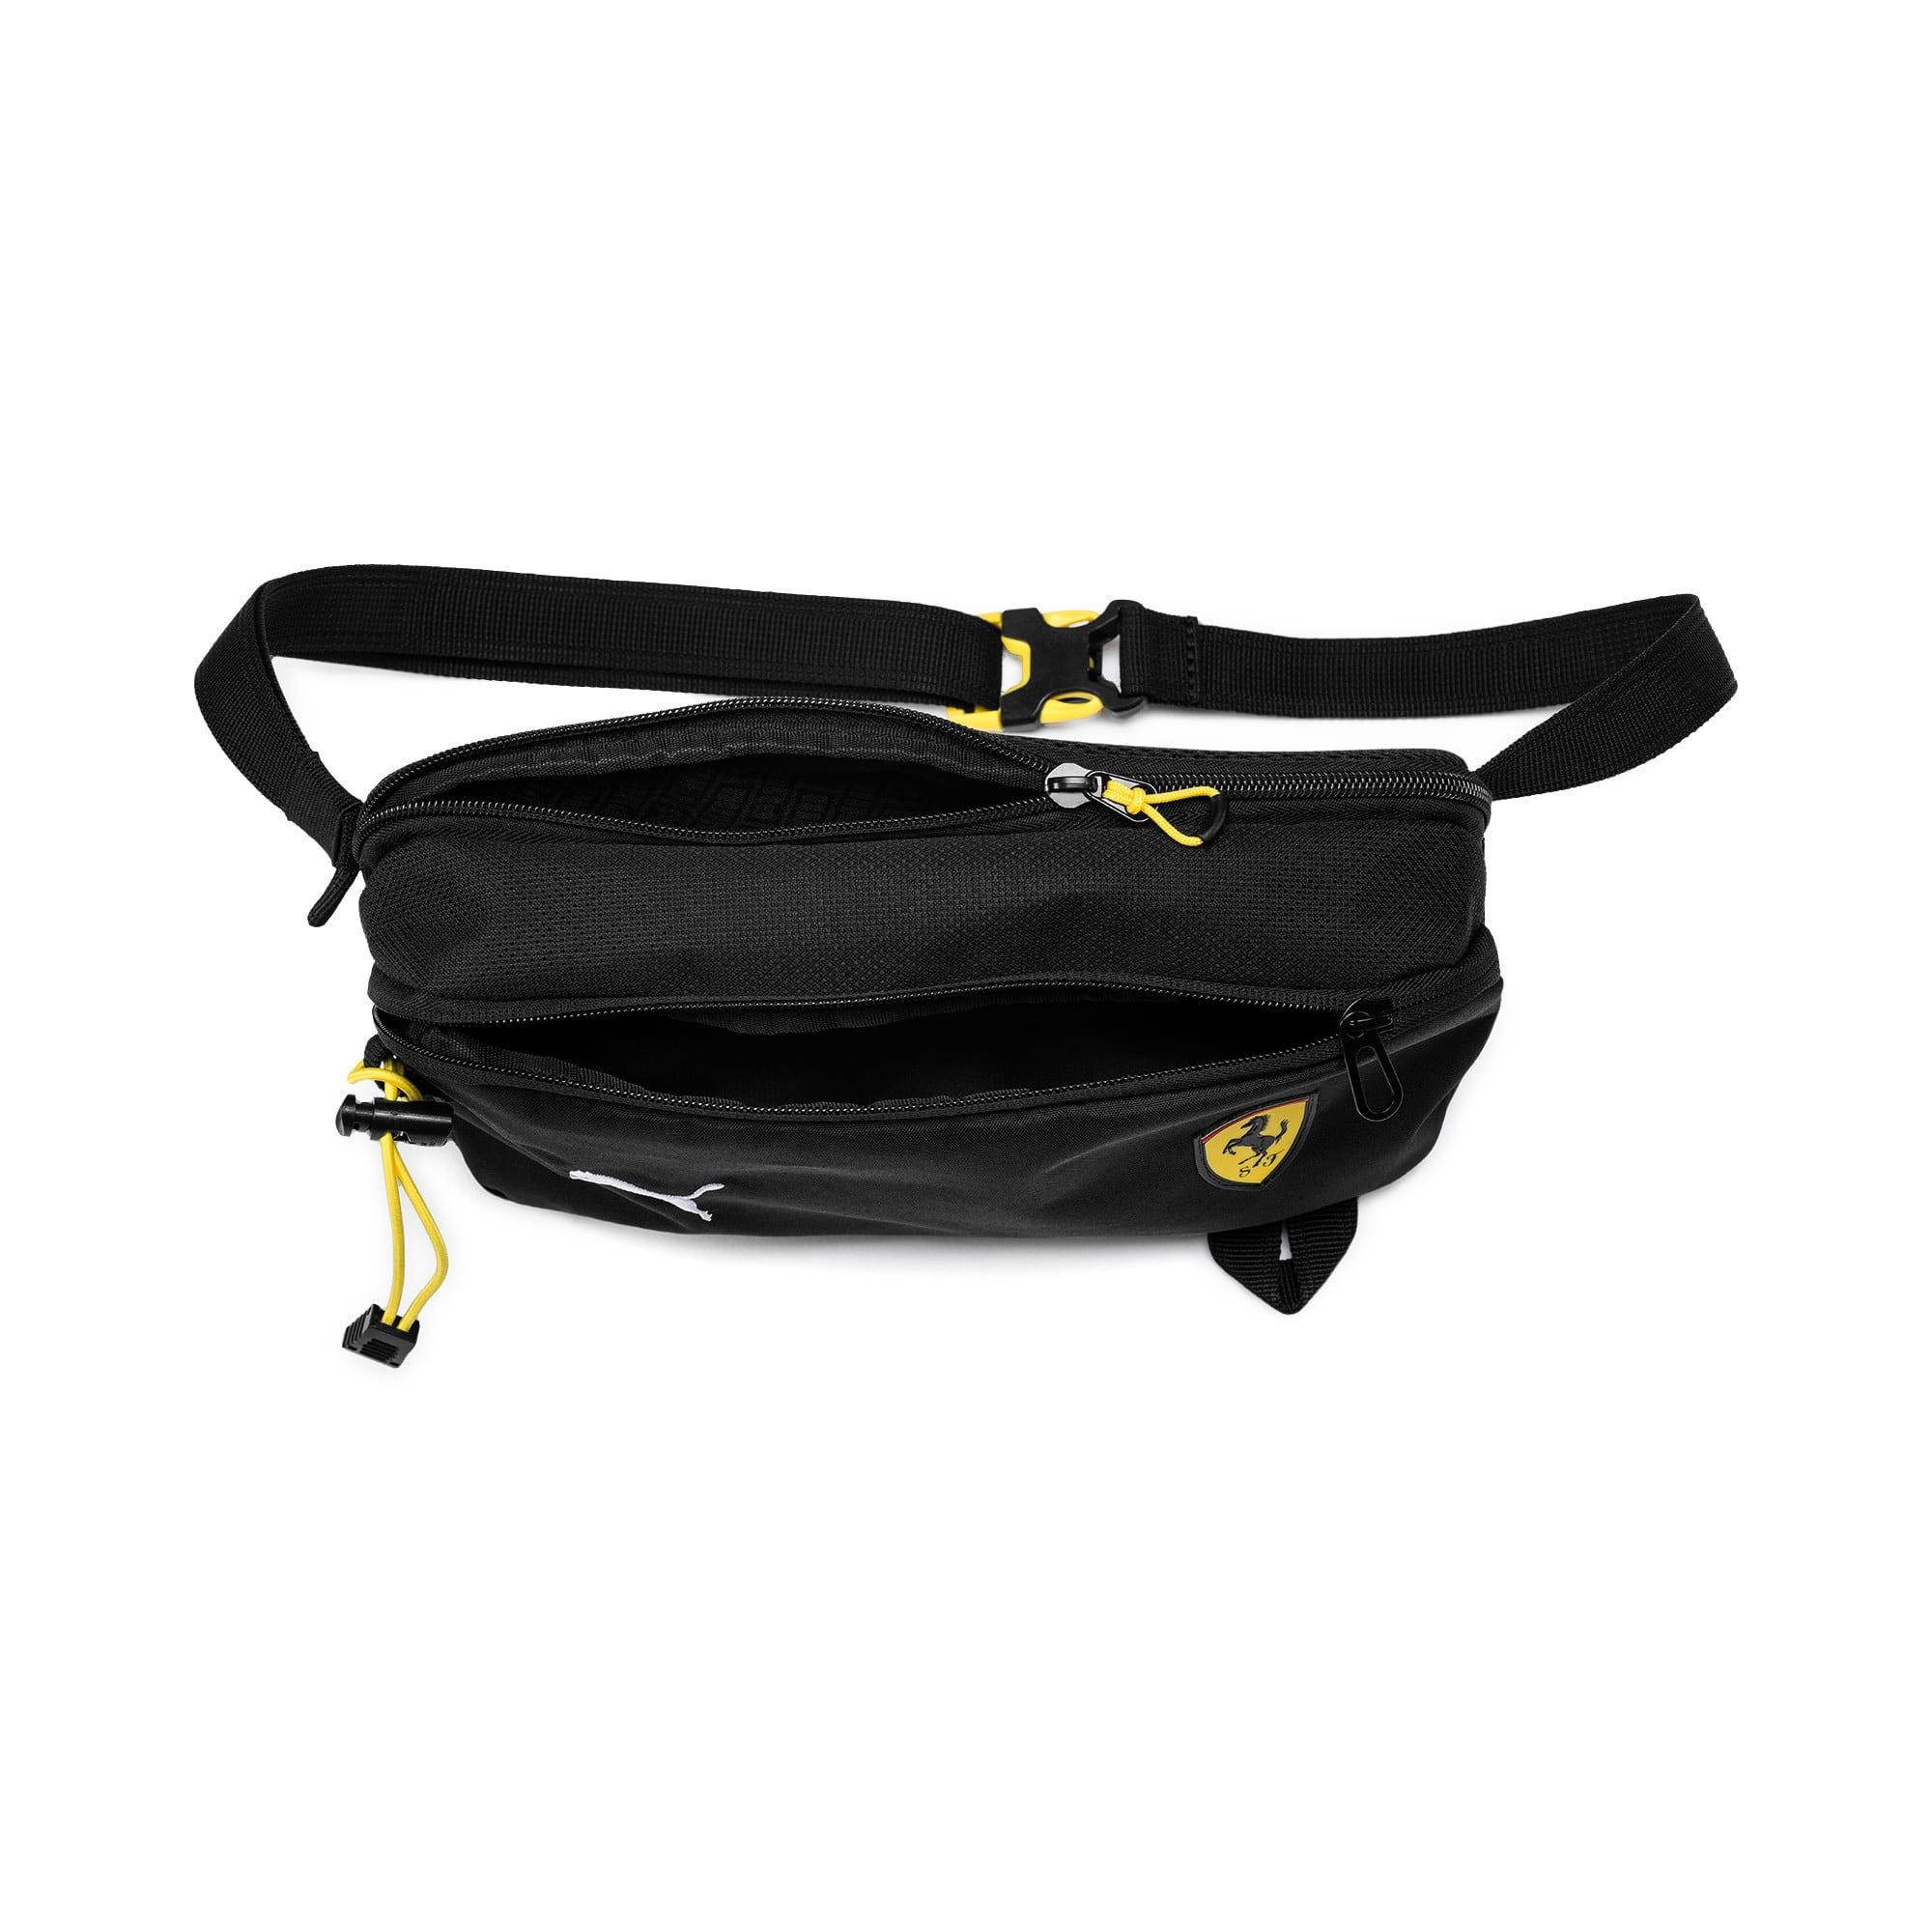 Thumbnail 3 of Ferrari Fanwear Waist Bag, Puma Black, medium-IND